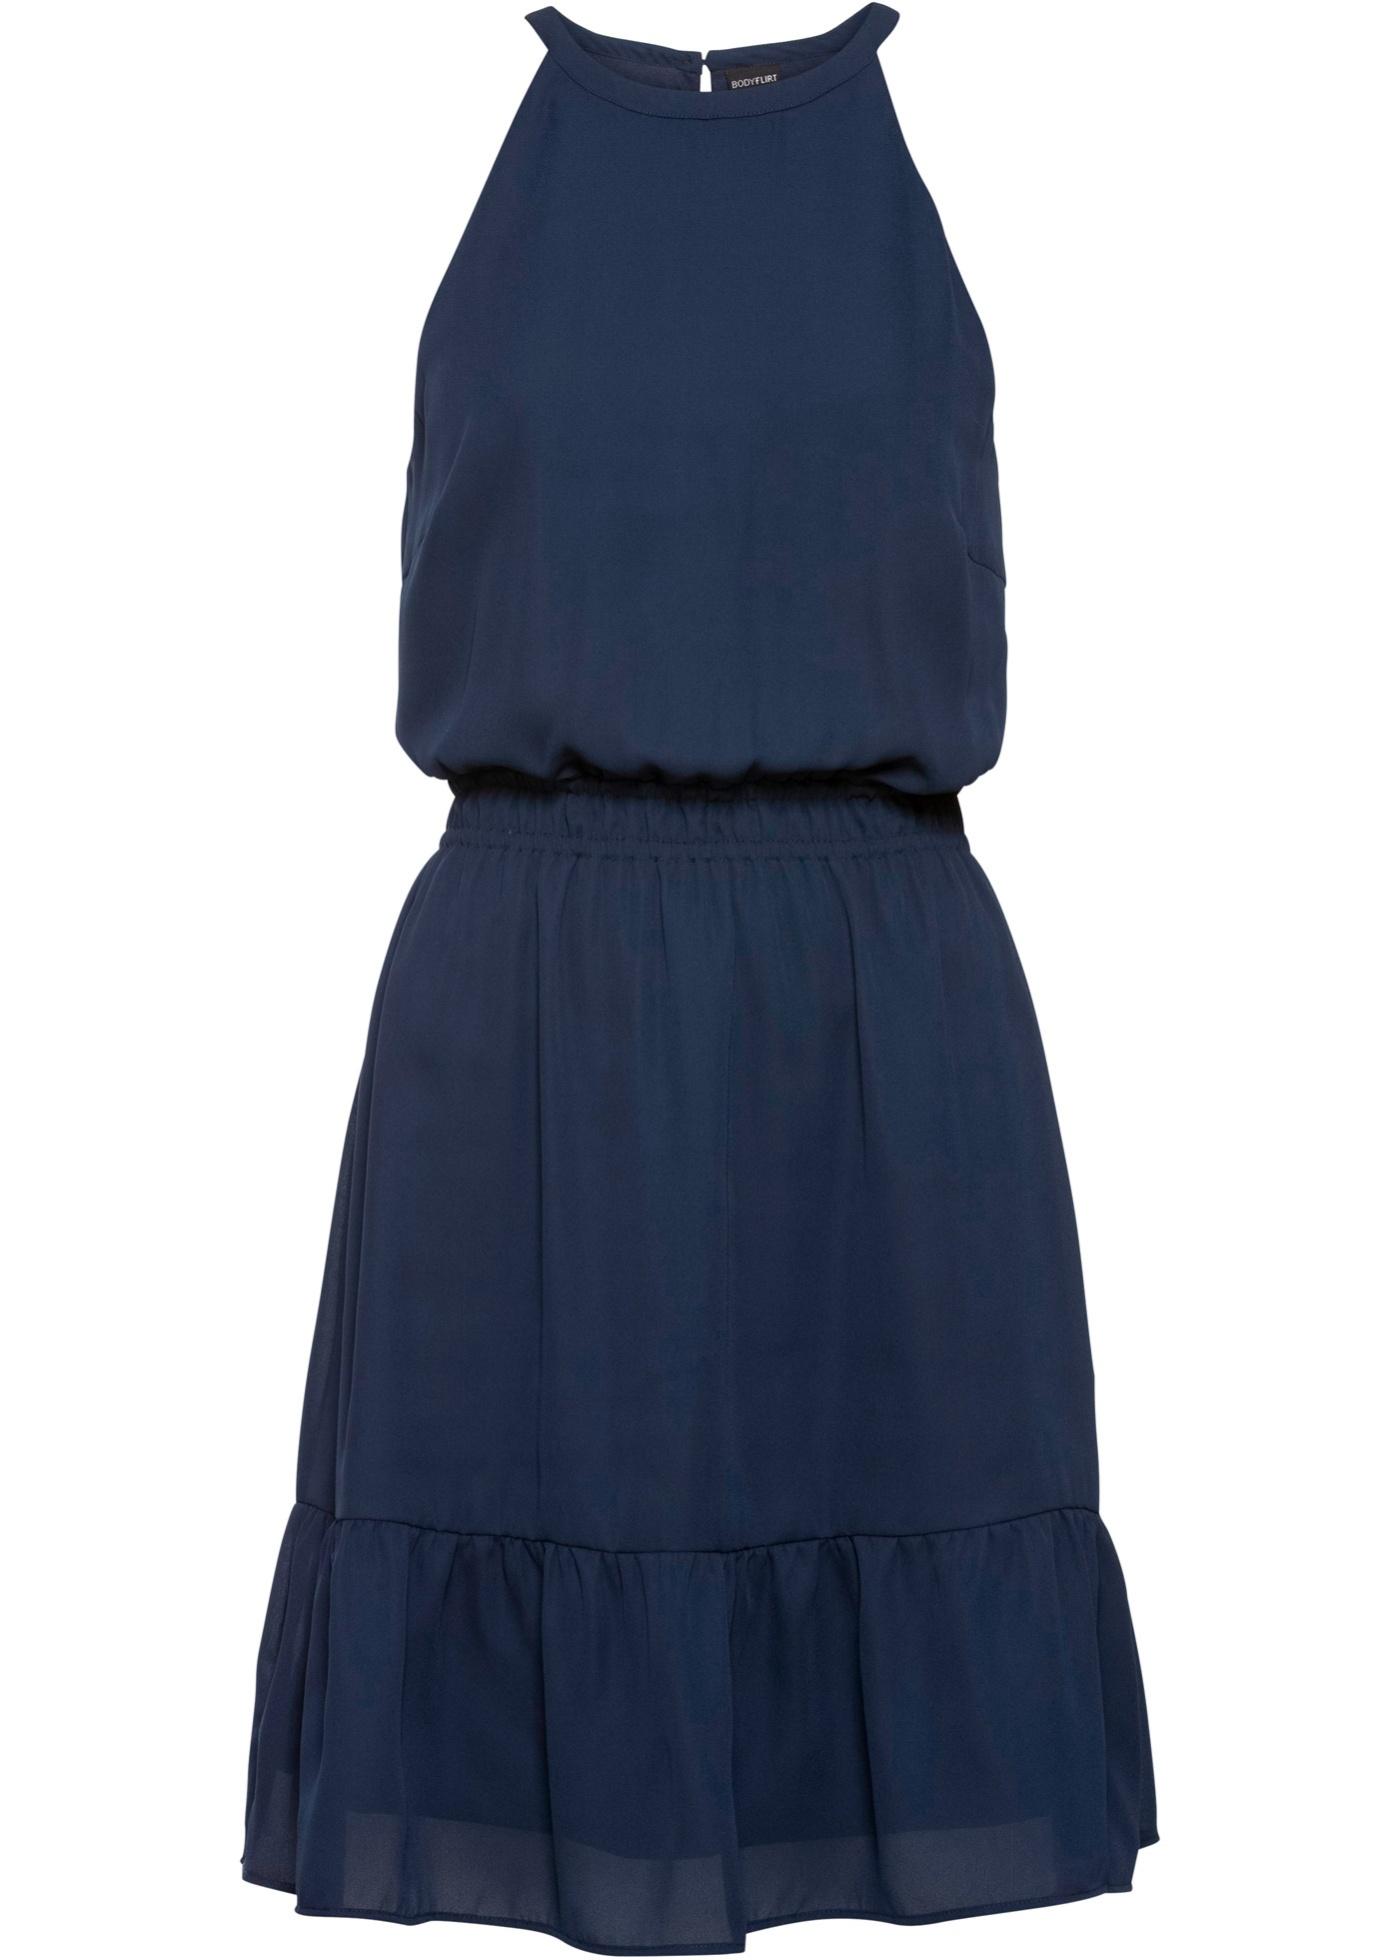 kleid mit volants gr. 48 dunkelblau sommerkleid mini